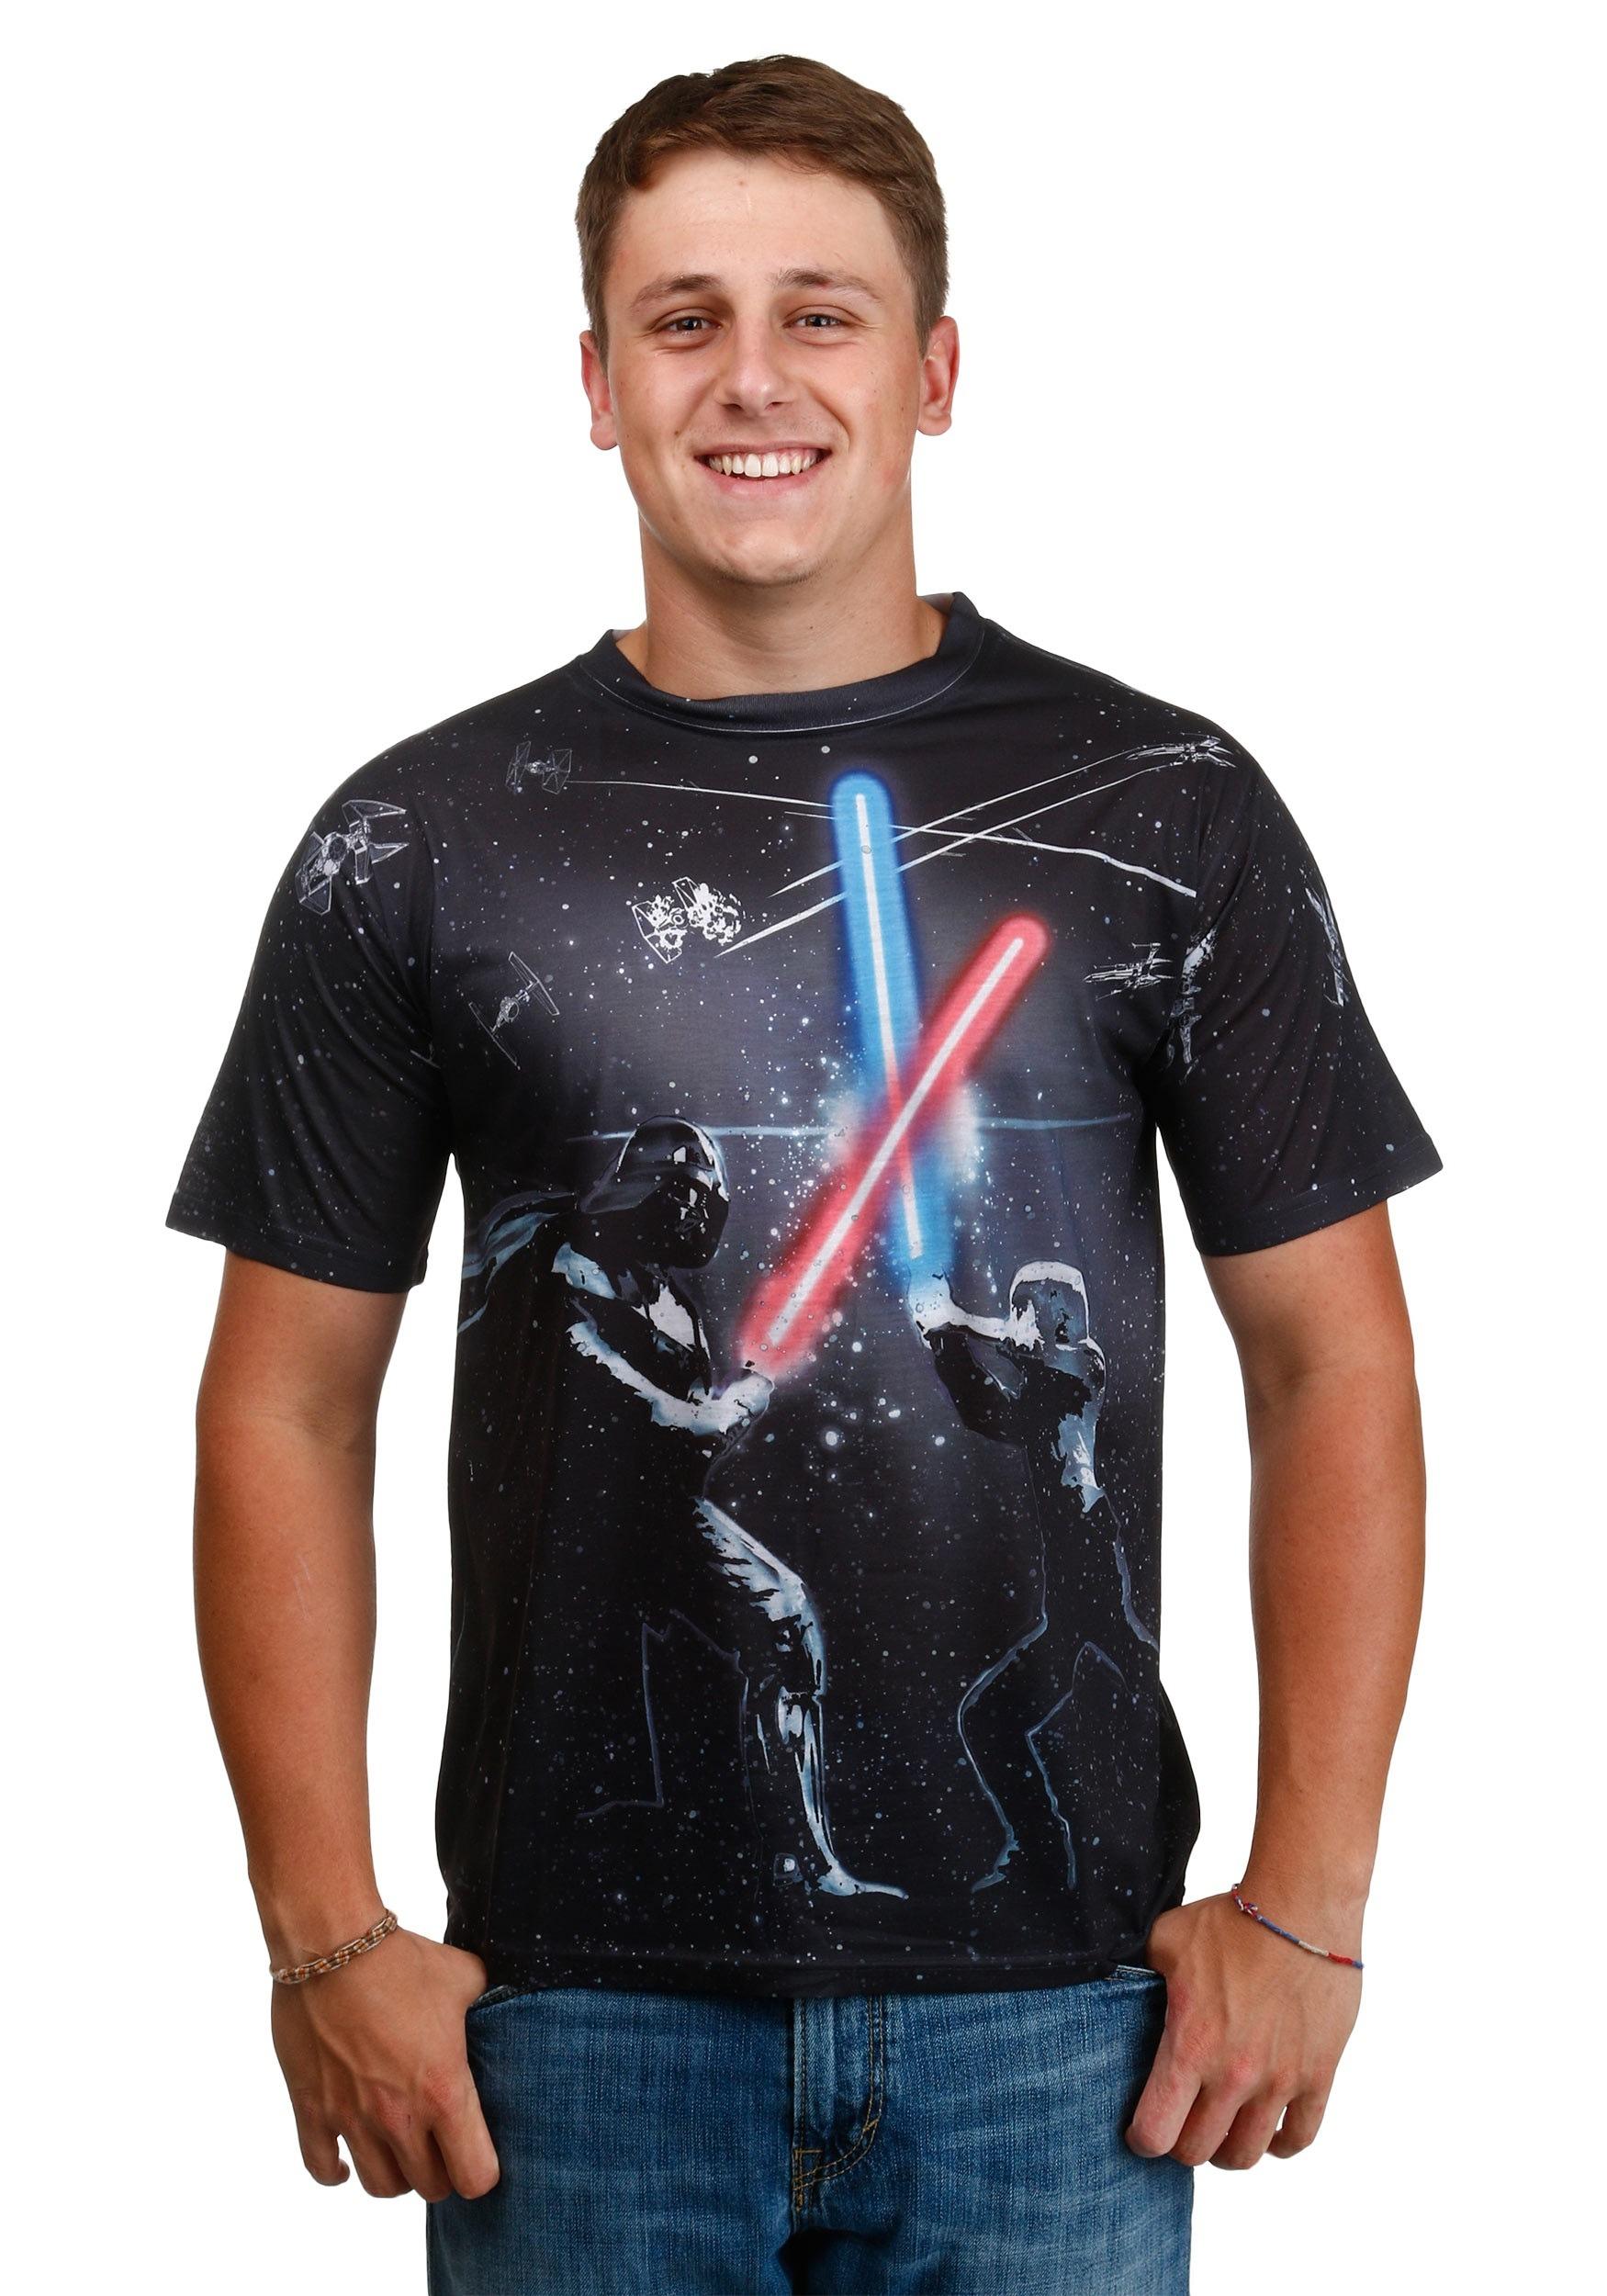 Star Wars All-Over Battle T-Shirt MASWRSRAMQMSCXX